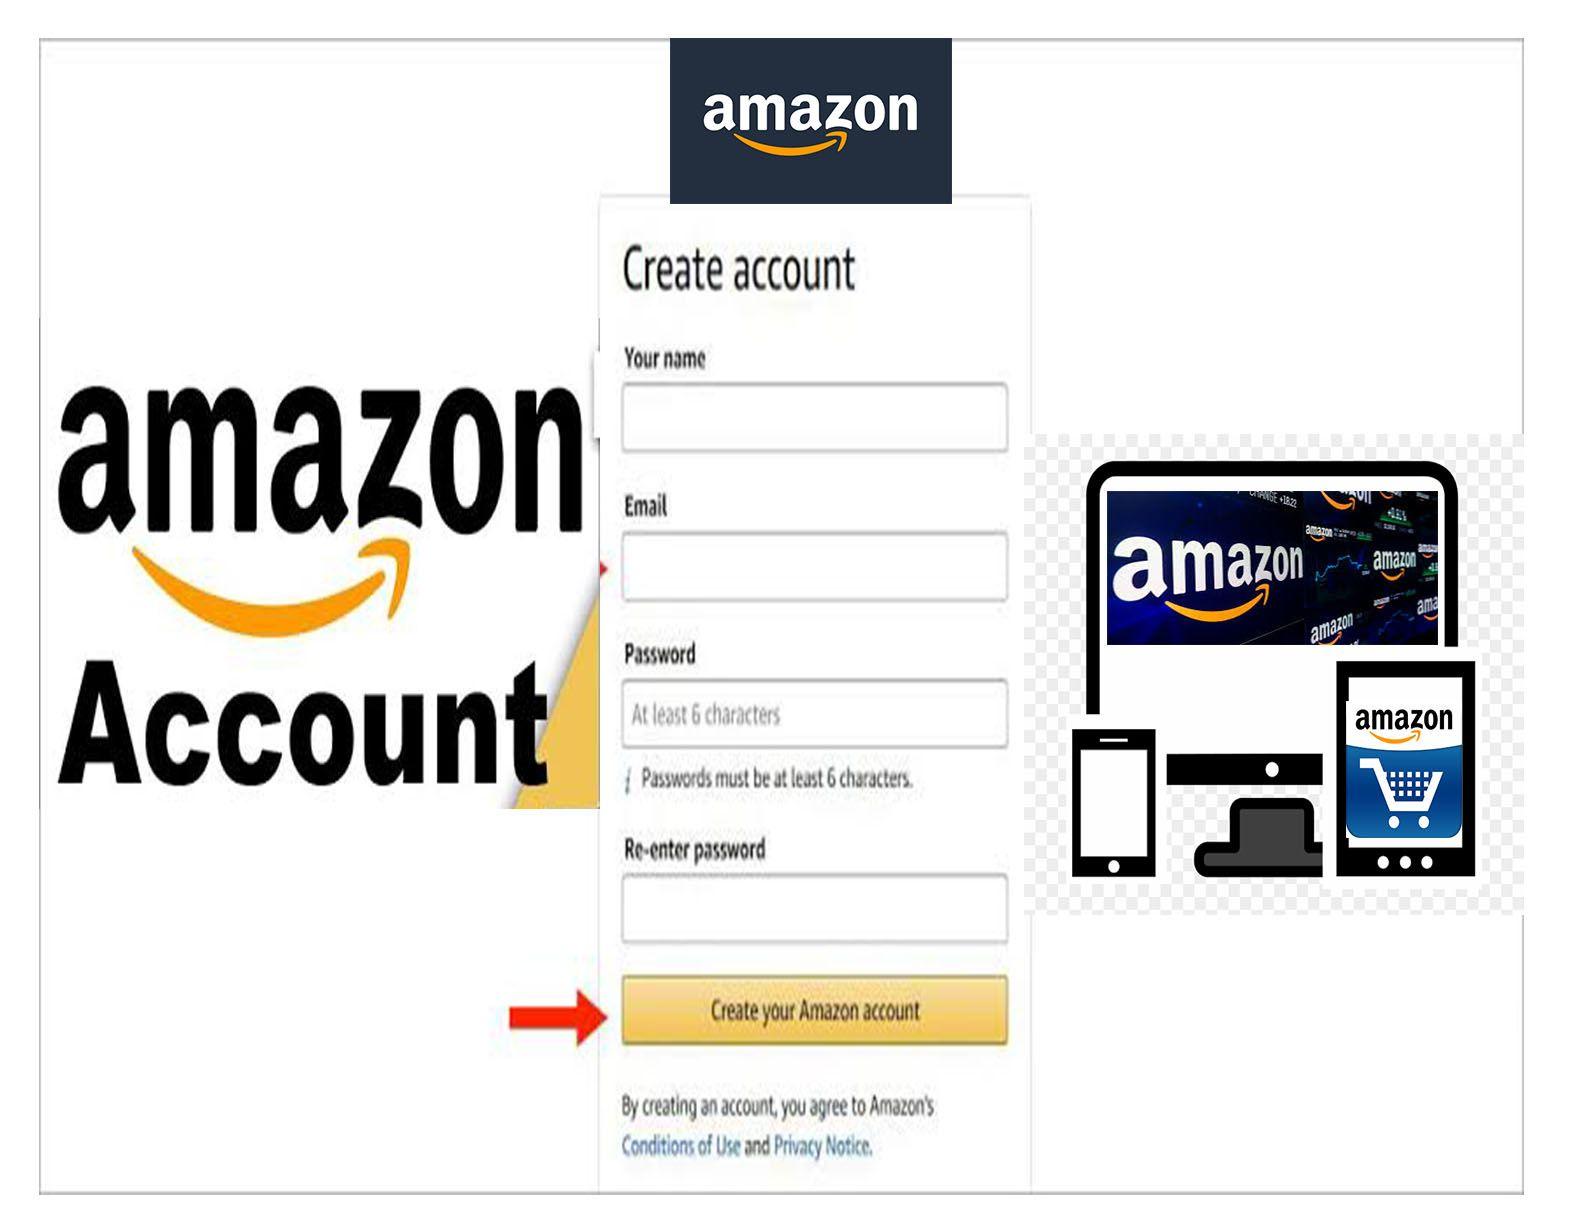 Amazon Account Create Amazon Account in 2020 Amazon